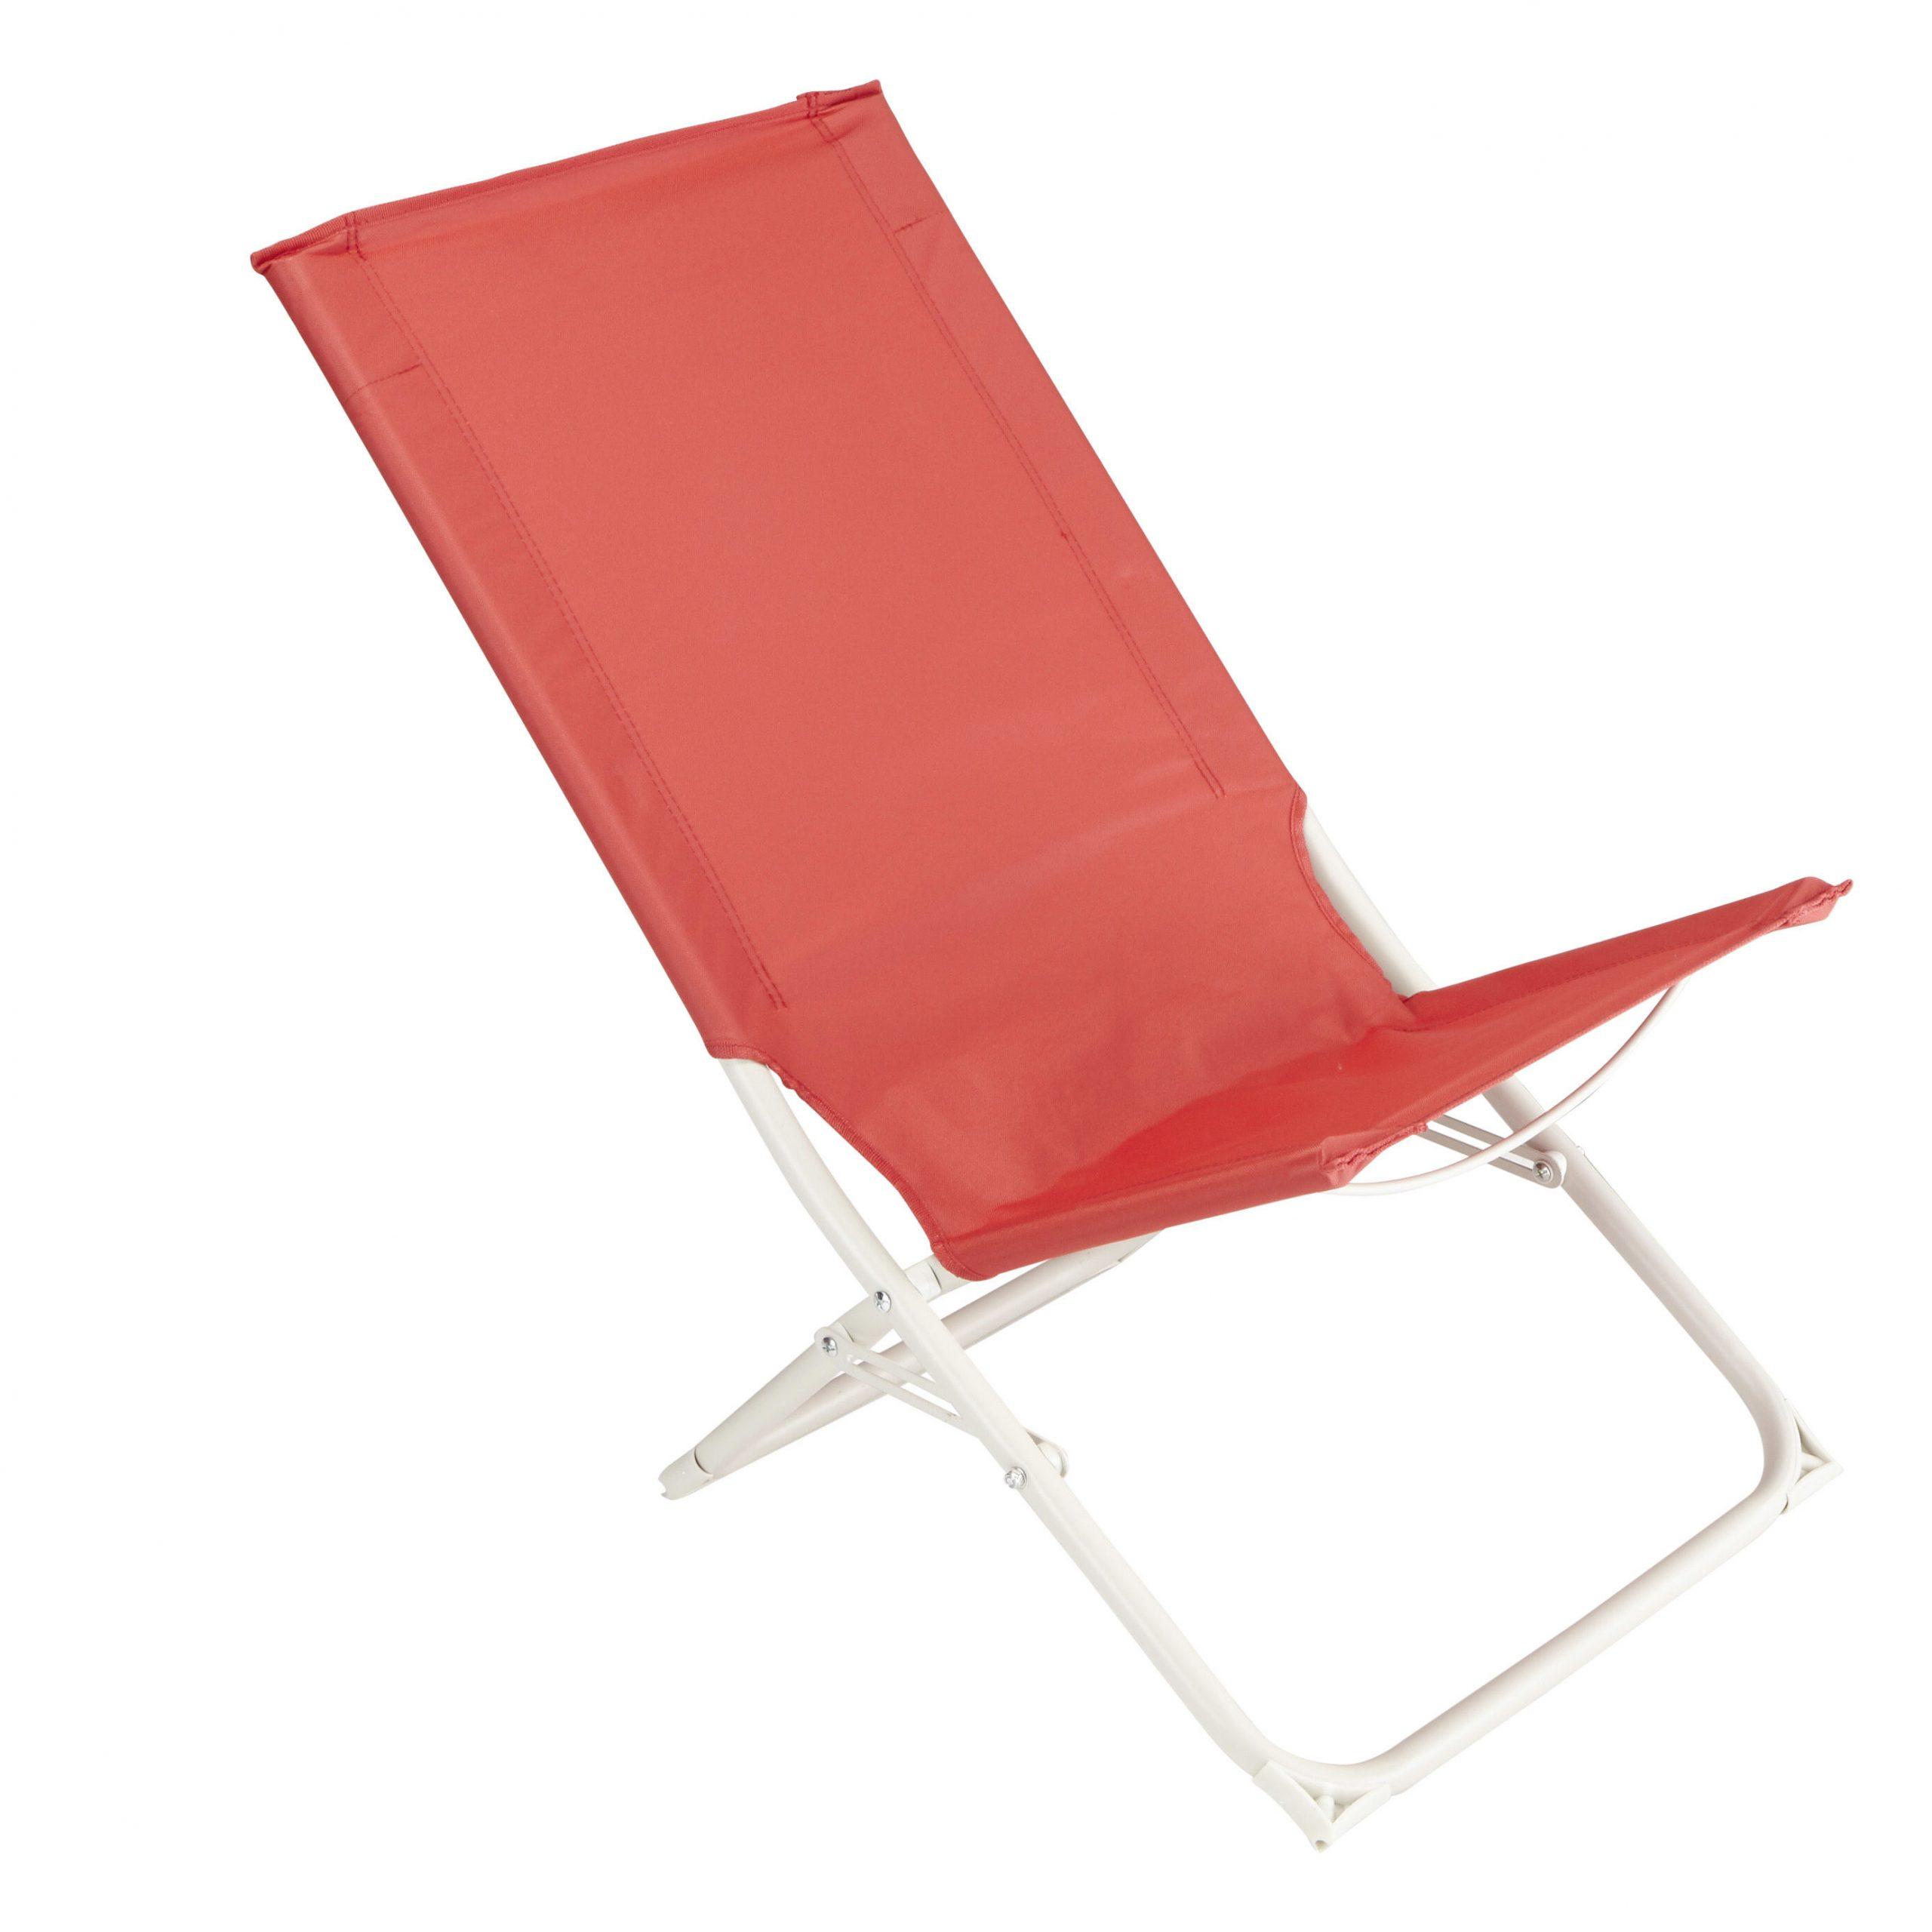 Fauteuil Relax Ikea Nouveau Balancelle De Jardin Carrefour ... pour Transat Jardin Carrefour